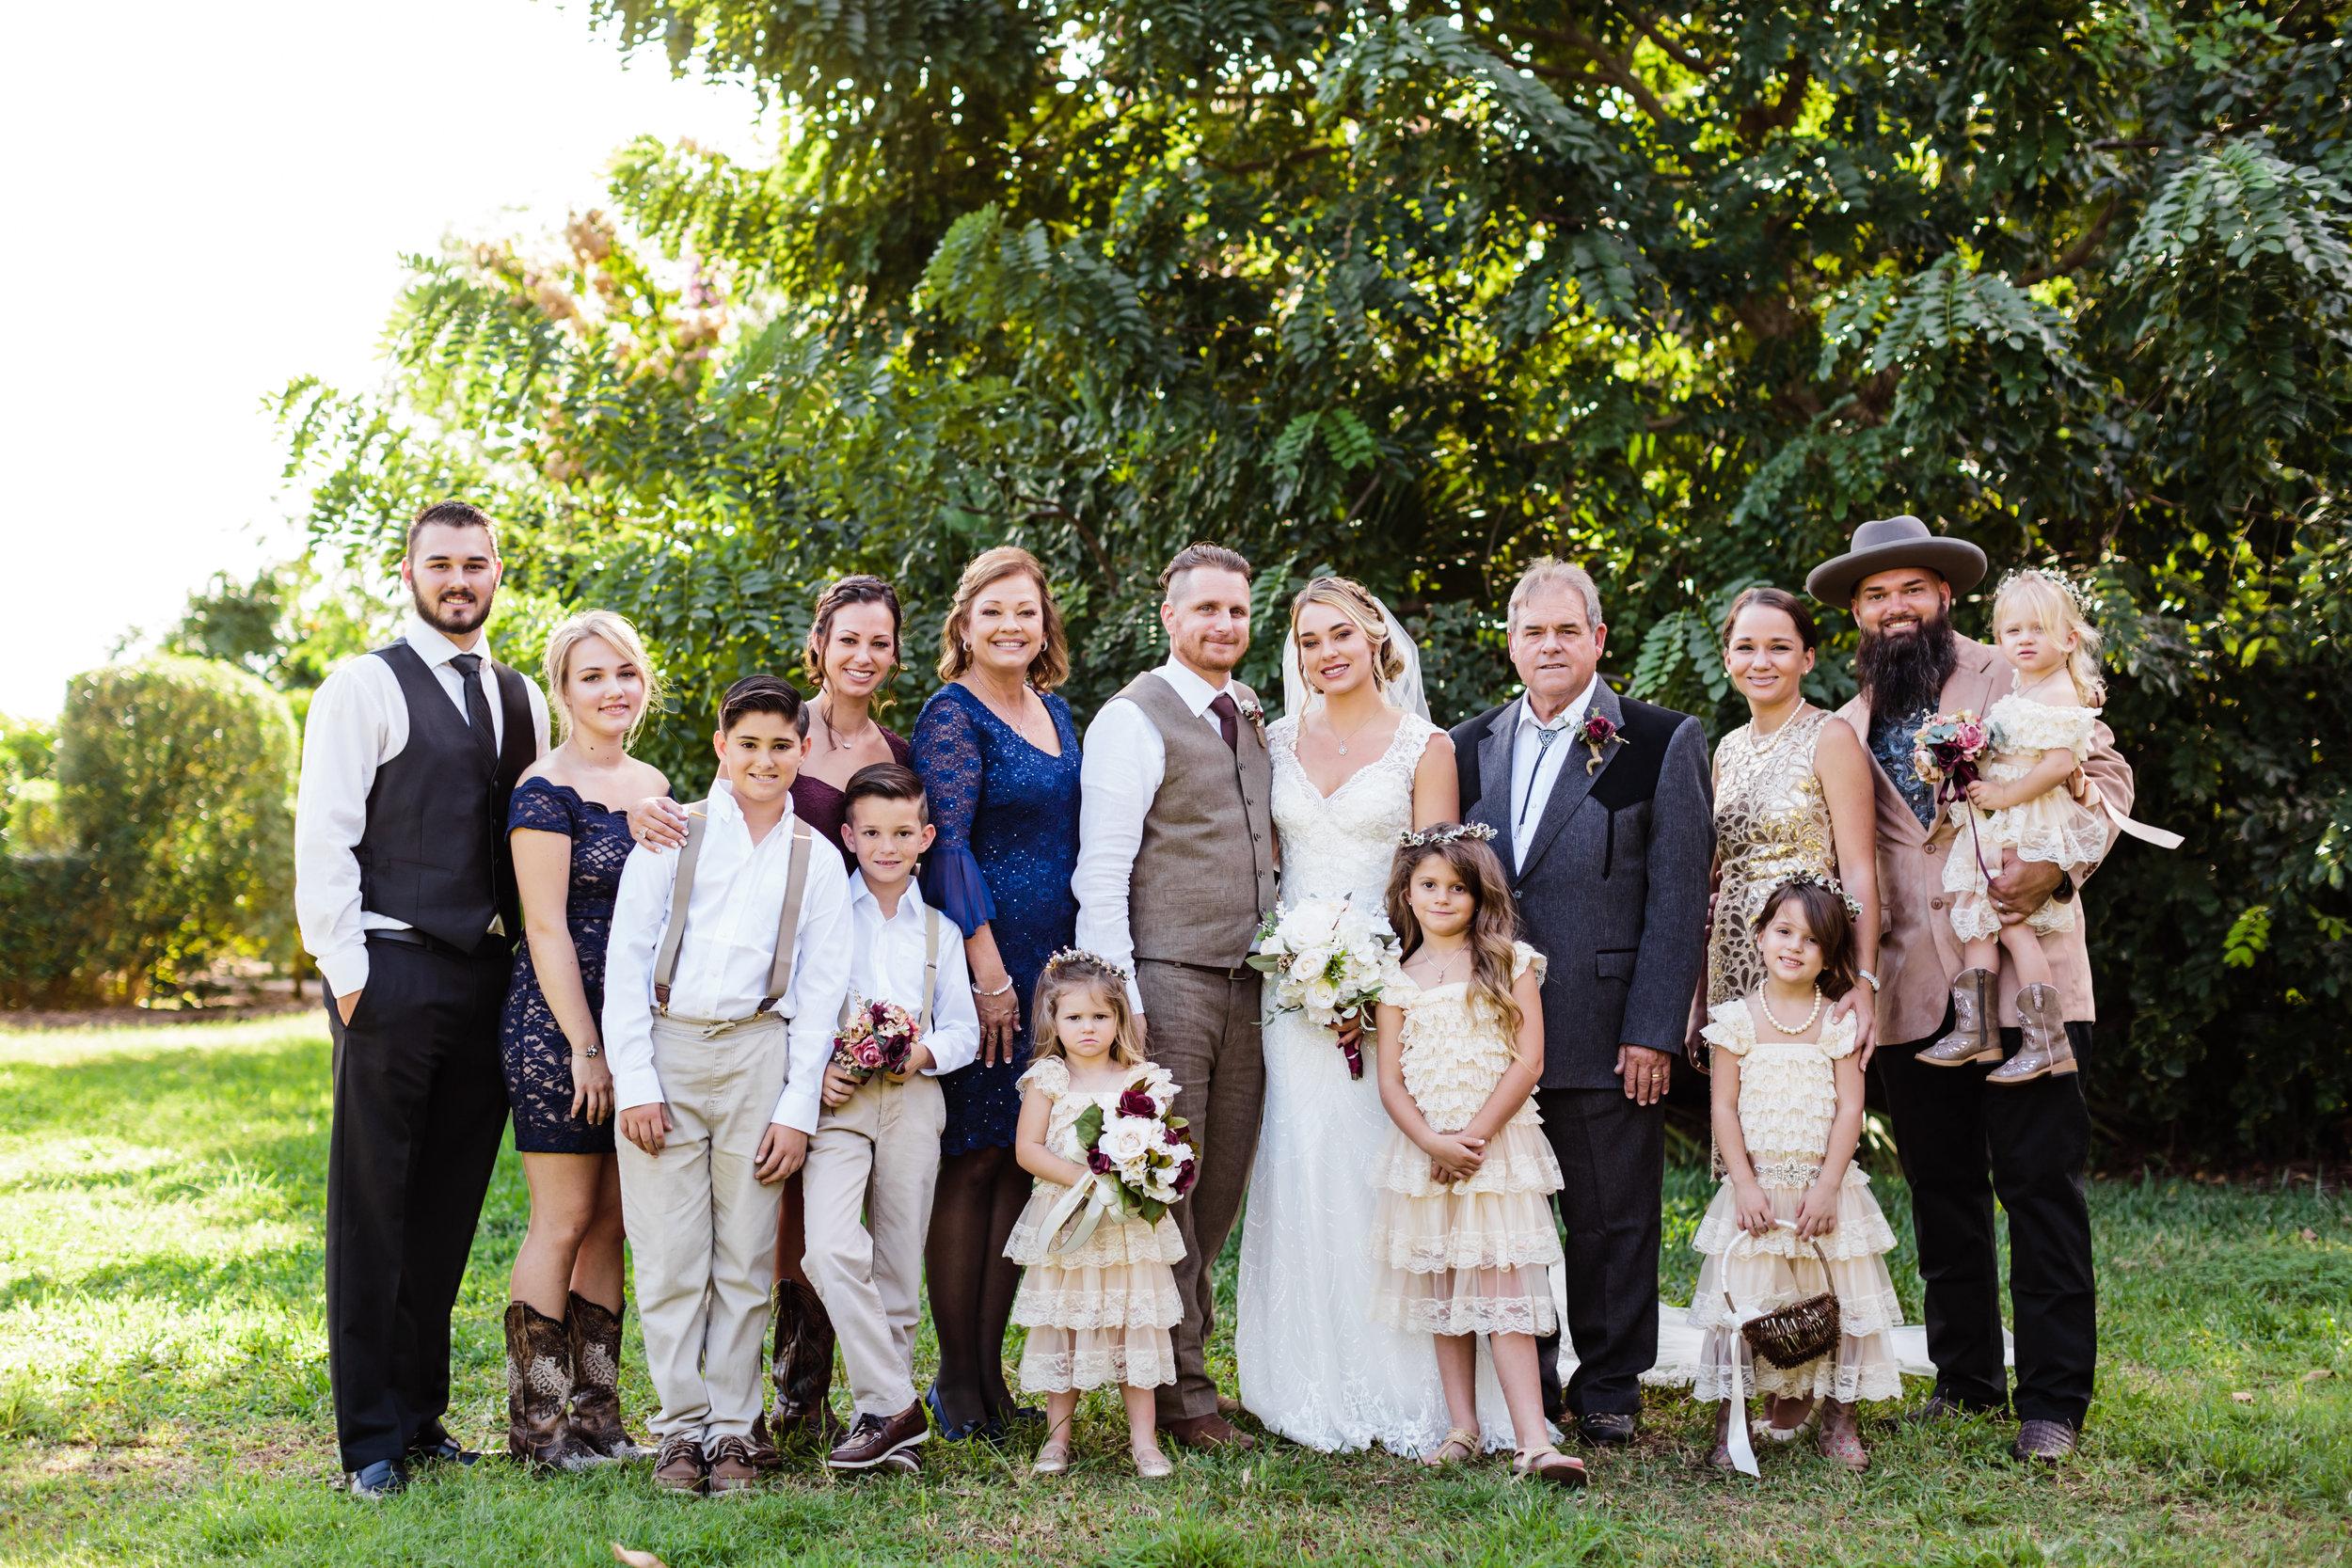 2018.11.18 Steve and Emily Mounts Botanical West Palm Beach Wedding (321 of 827).jpg